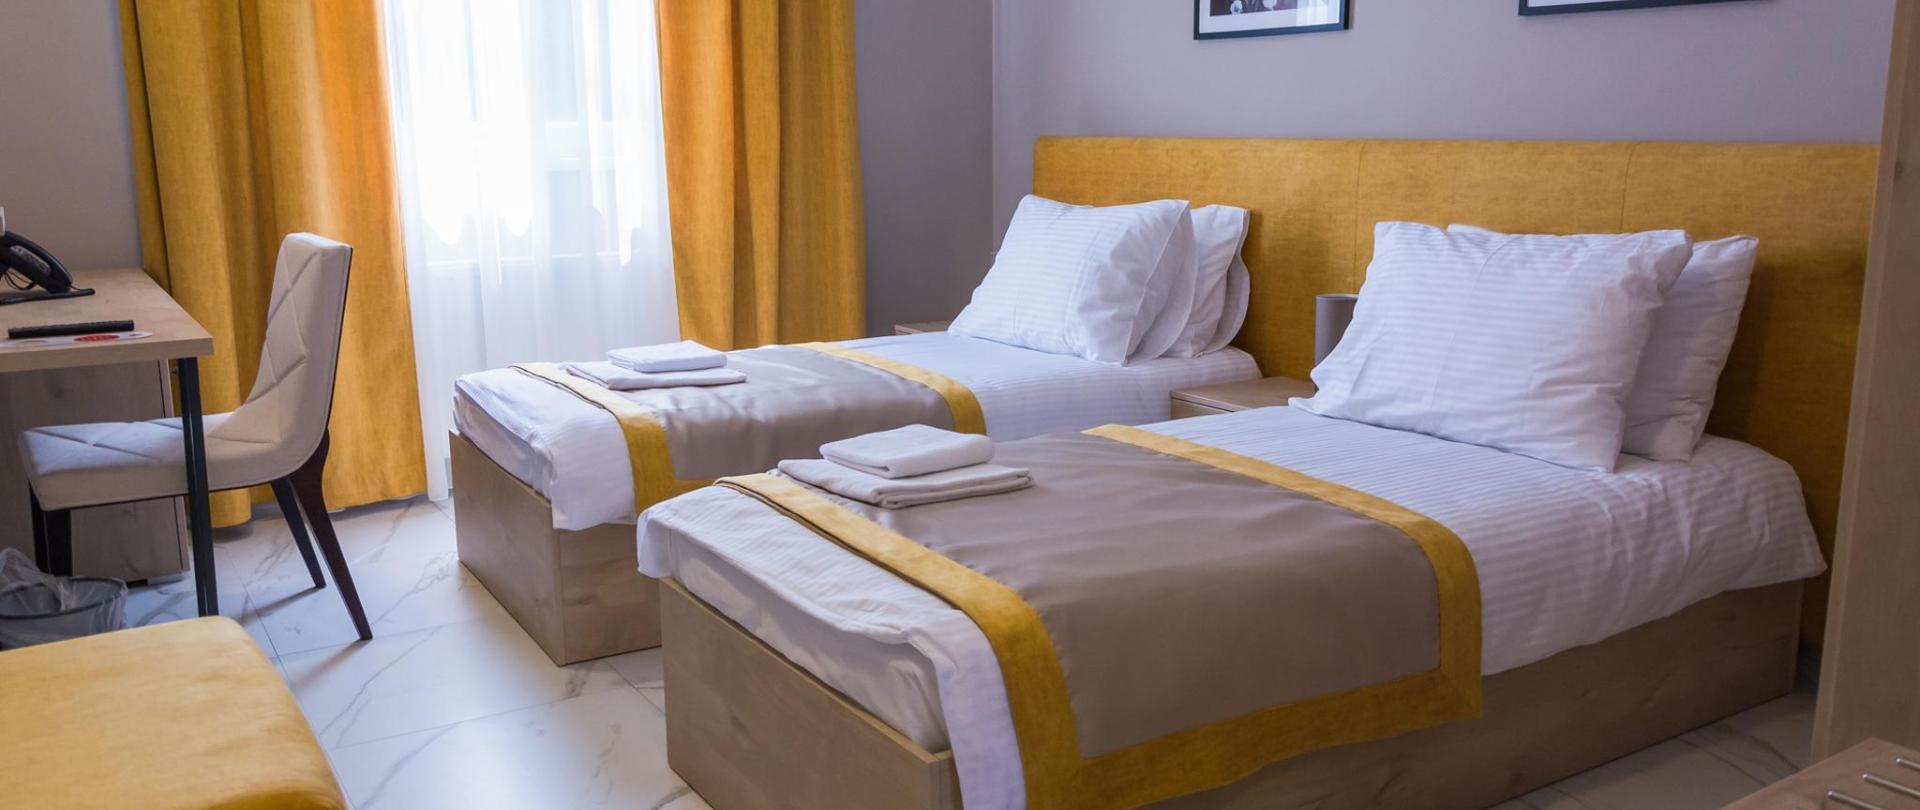 monogram_hotel_129.jpg